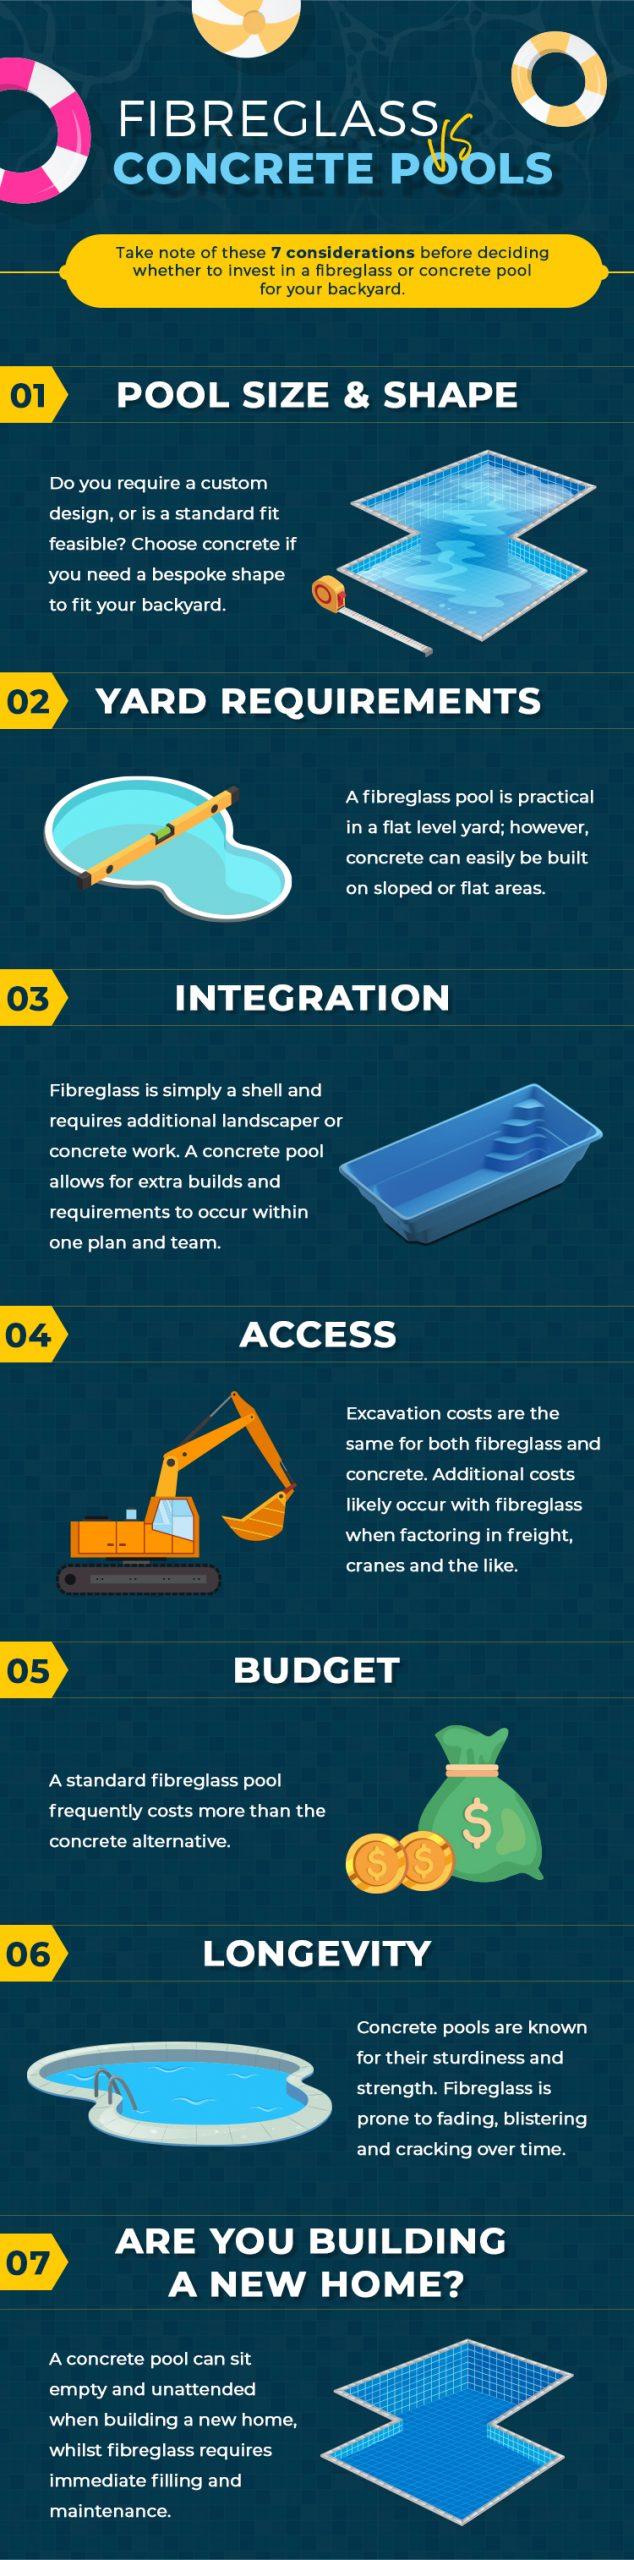 Fibreglass VS Concrete Pools - infographic